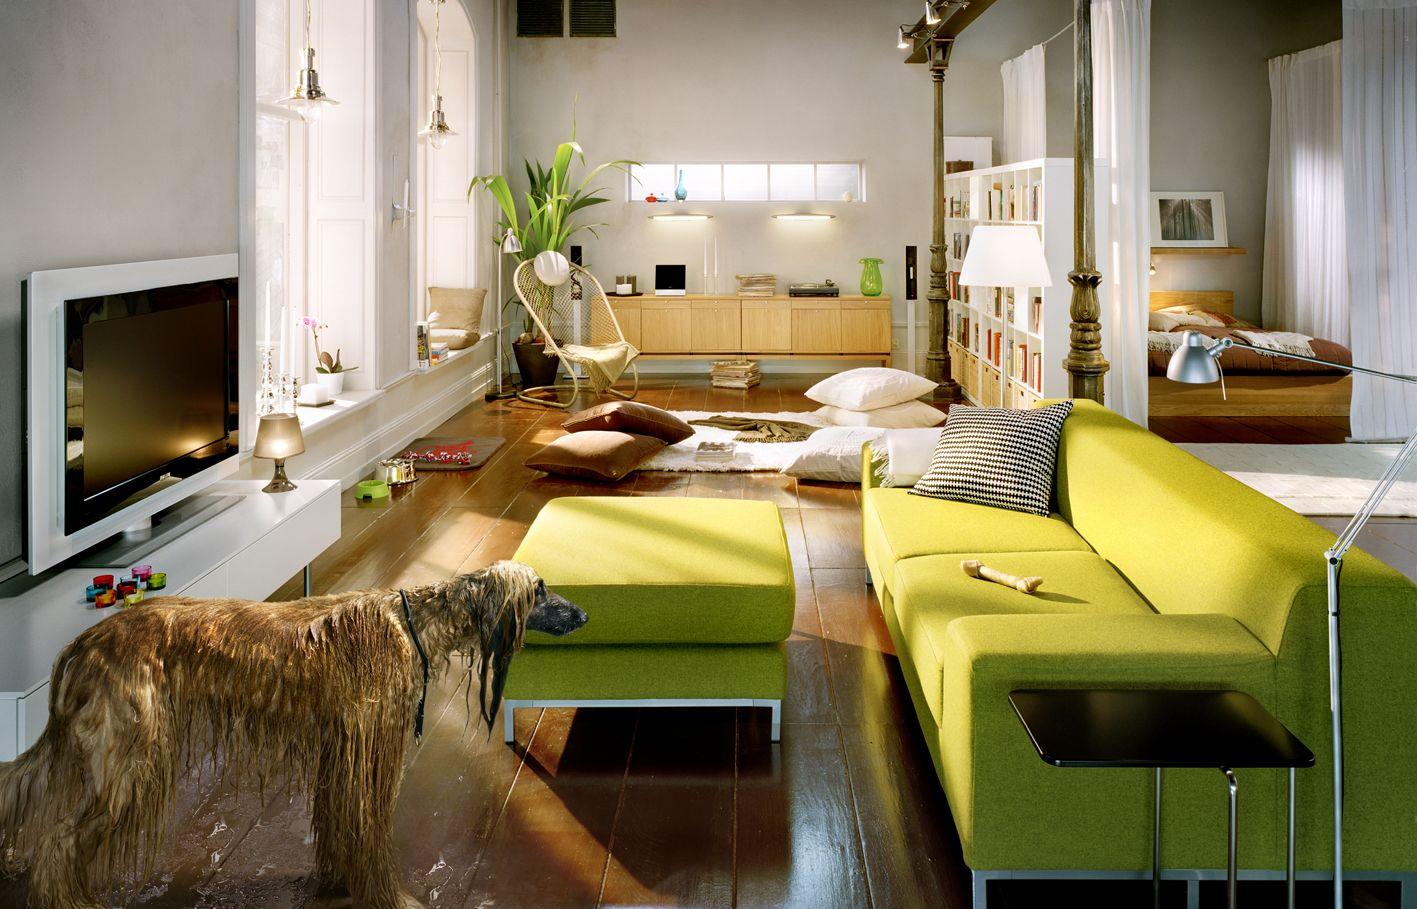 Family Room Interior Design Idea Home Interior Design Ideas Ikea ...